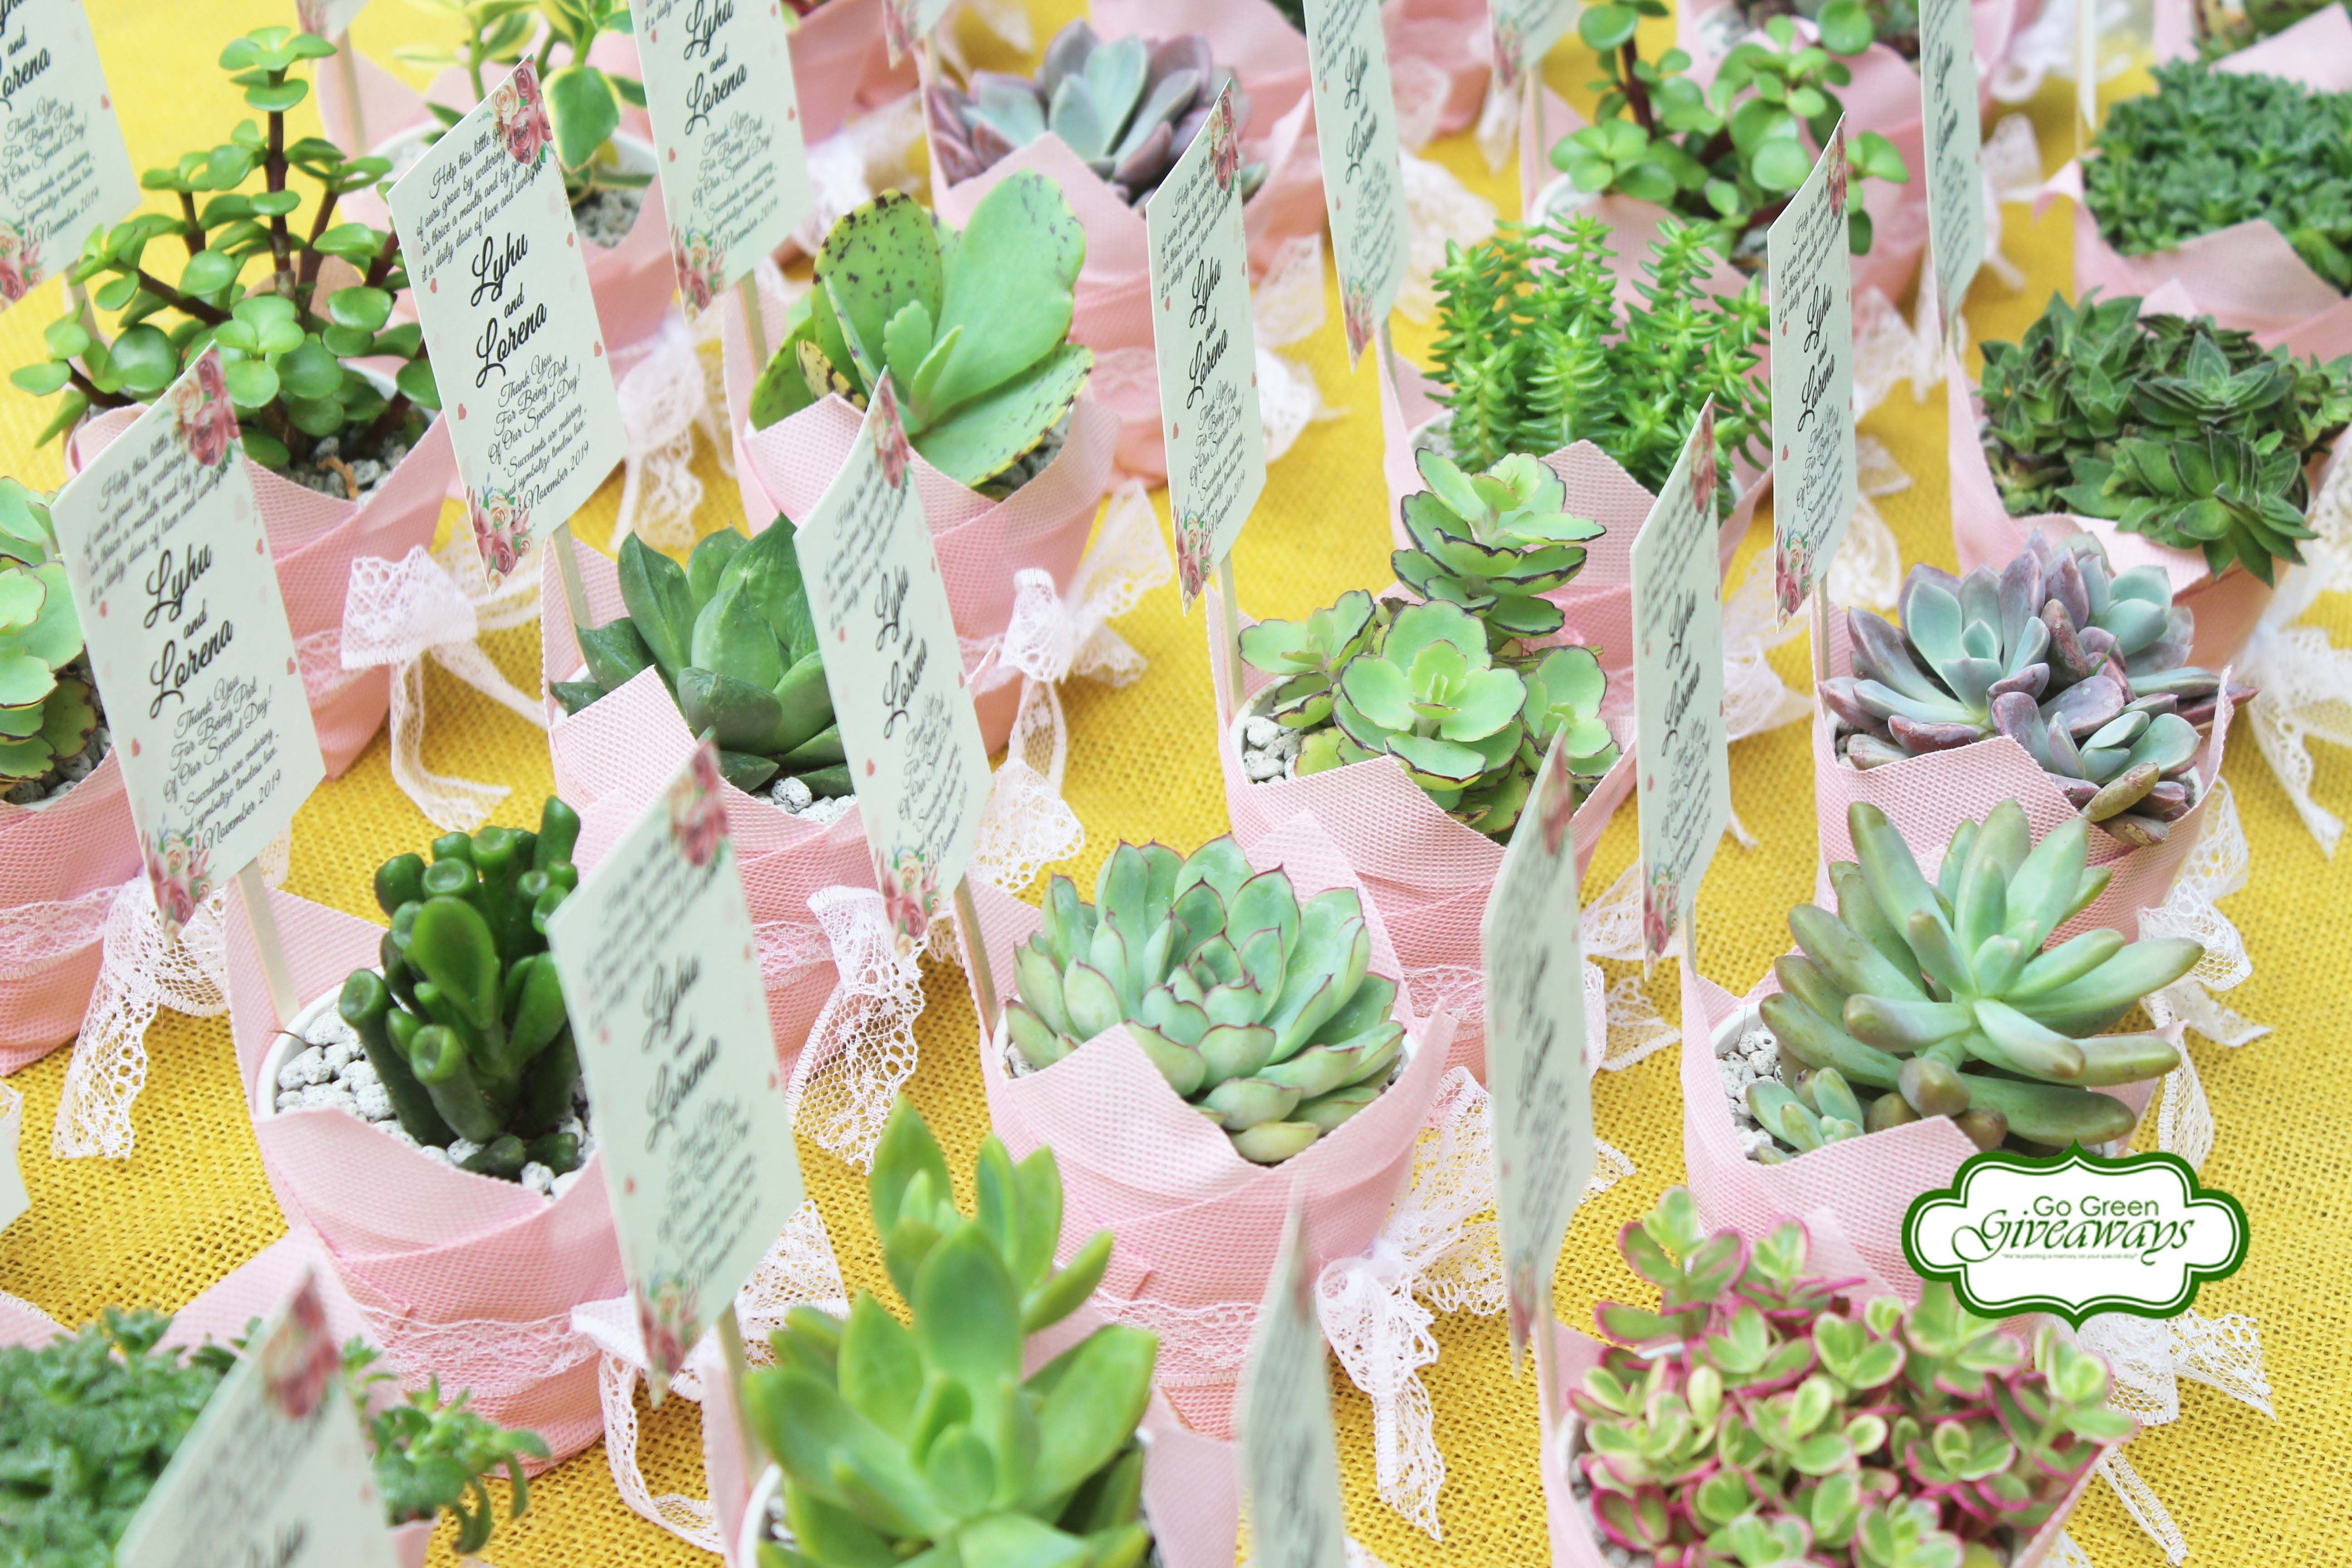 Lyhu & Lorena's succulents wedding favors in 2020